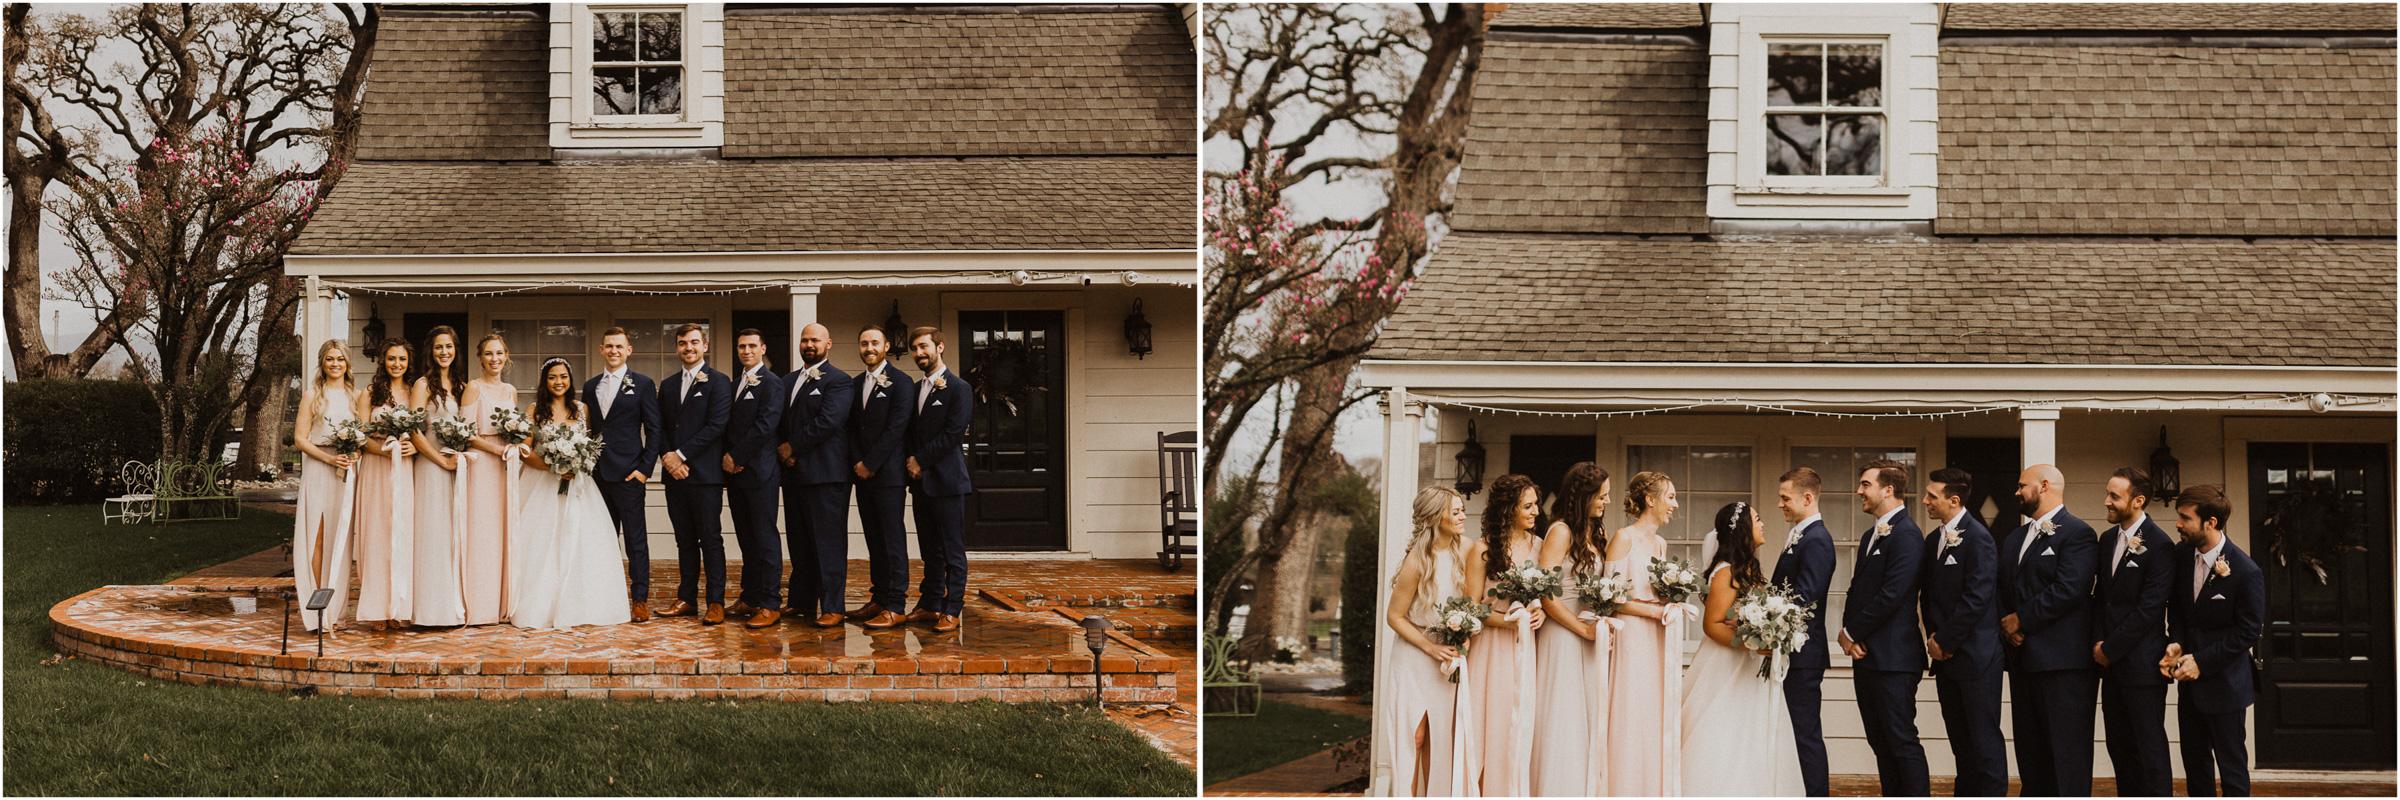 alyssa barletter photography destination wedding bay area san jose california winery photographer-30.jpg